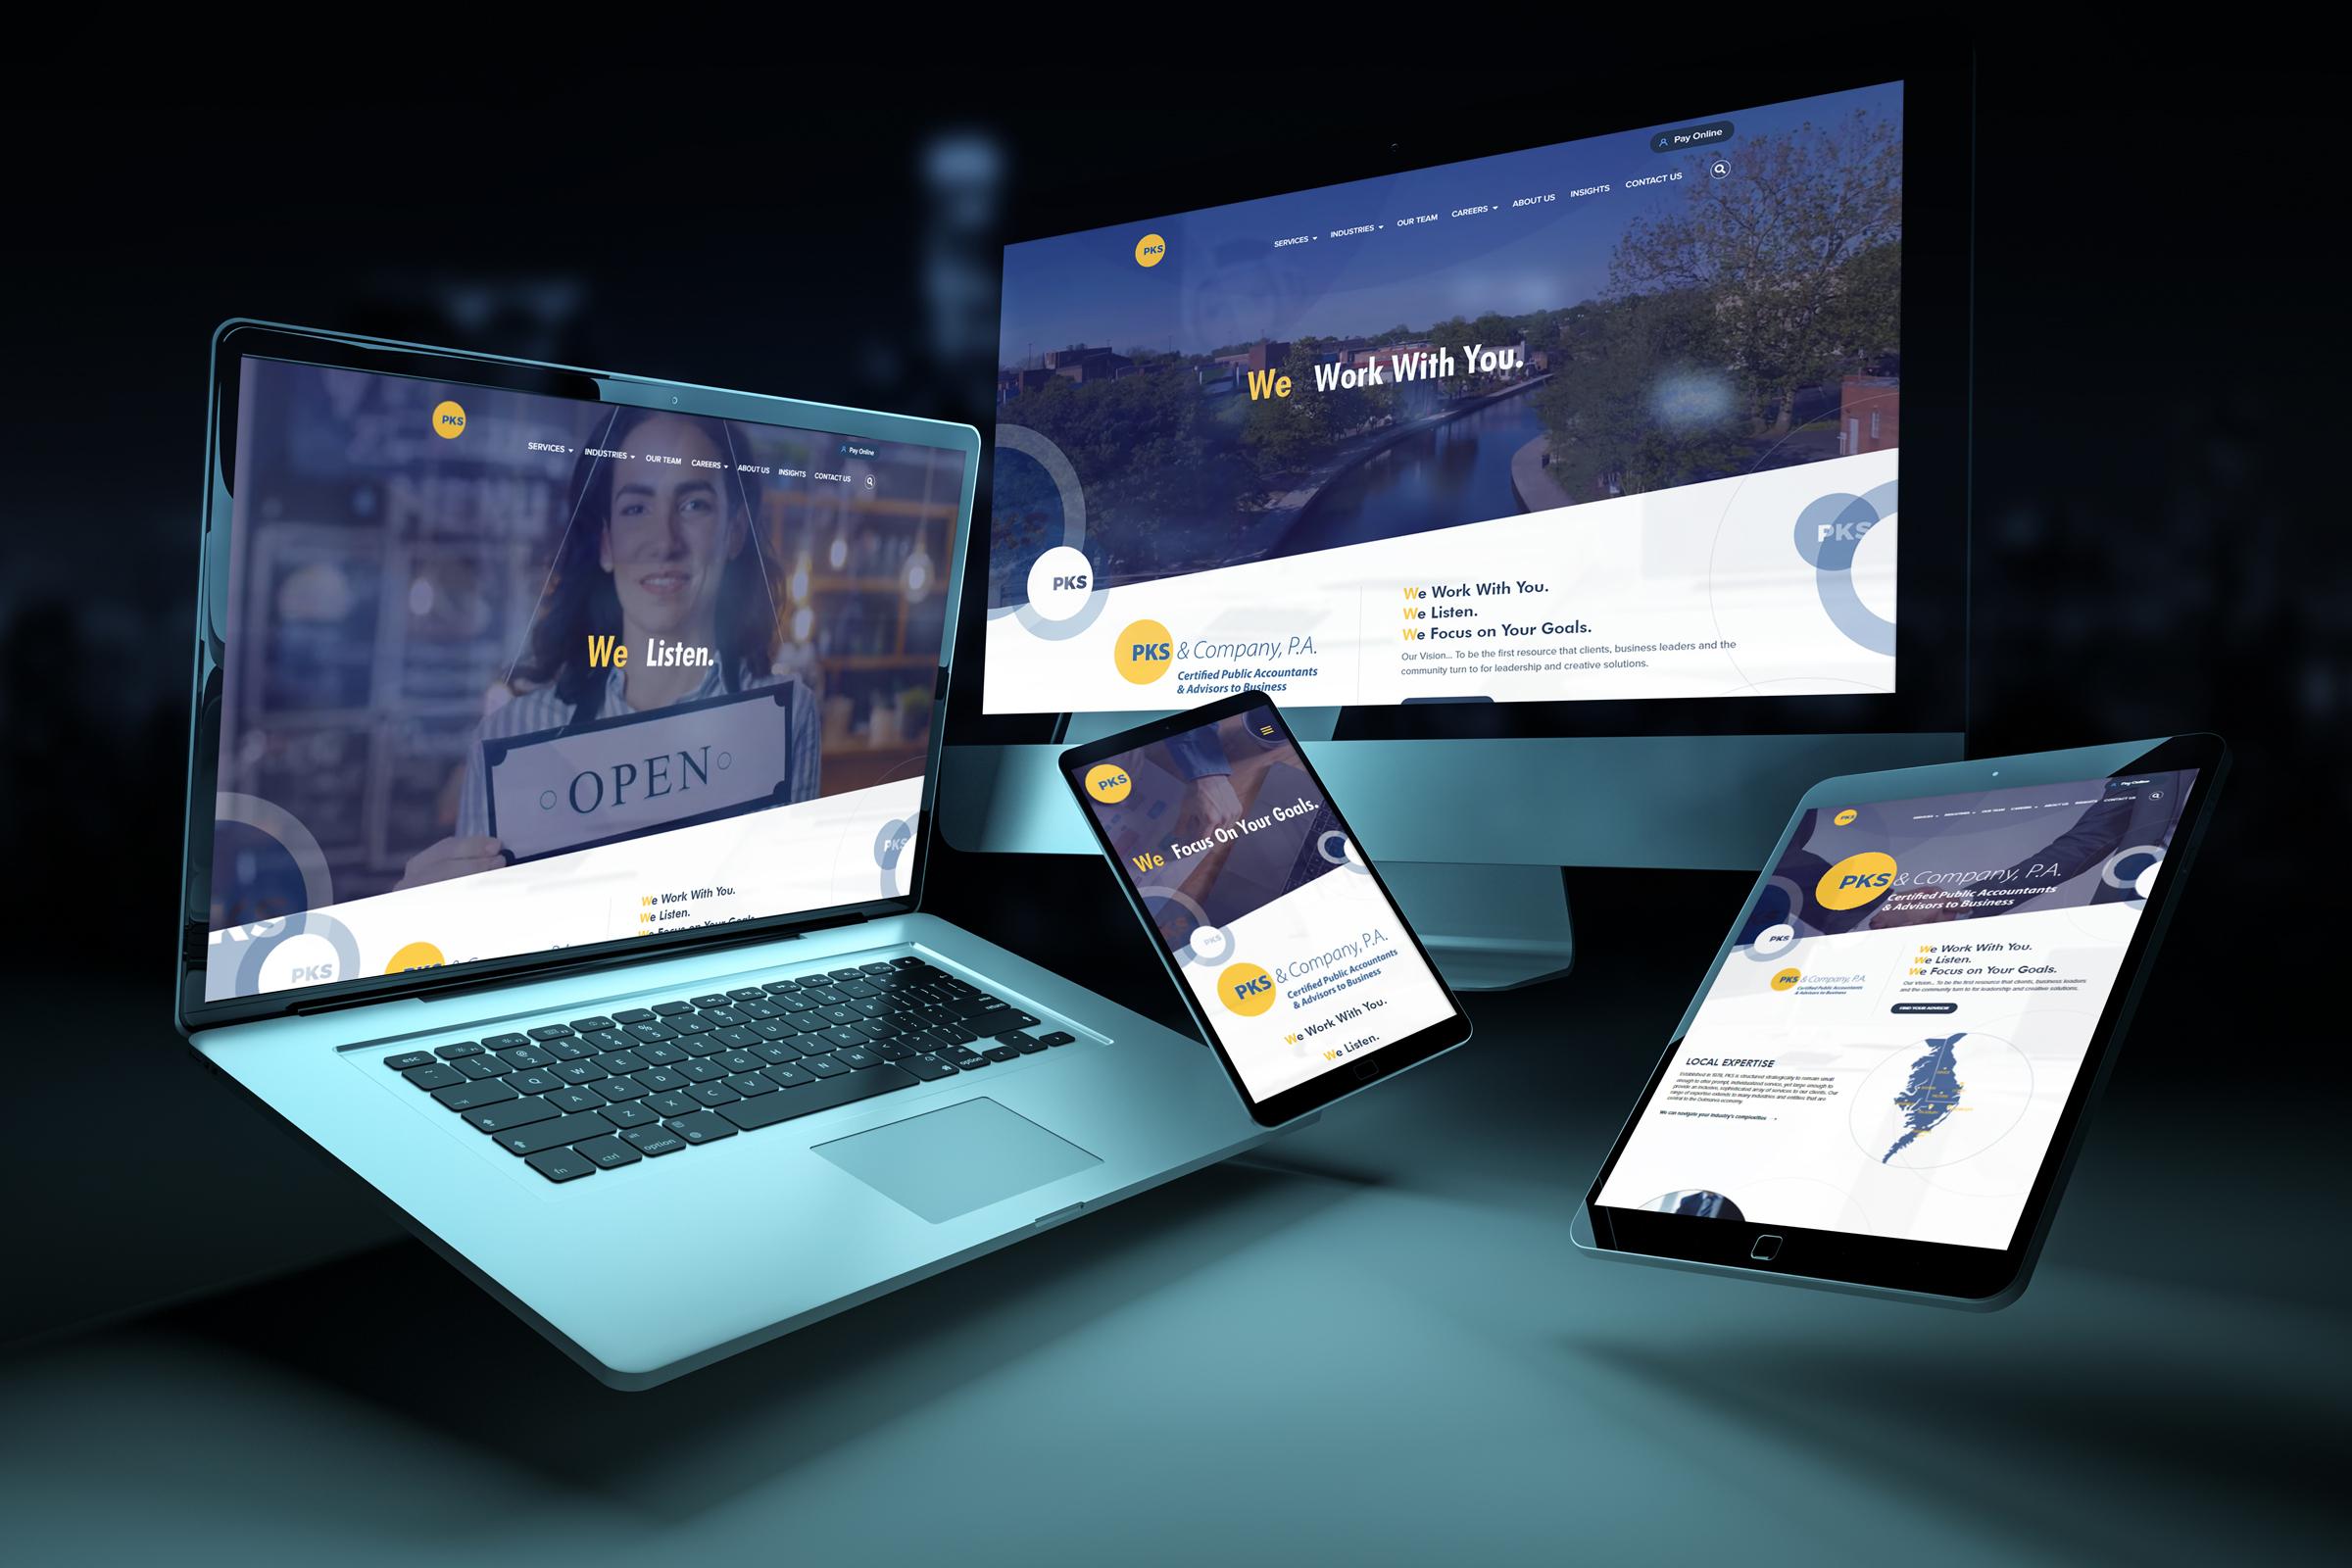 PKS CPA website redesign by local Salisbury and Ocean City Web Design Agency, Garner Group Marketing